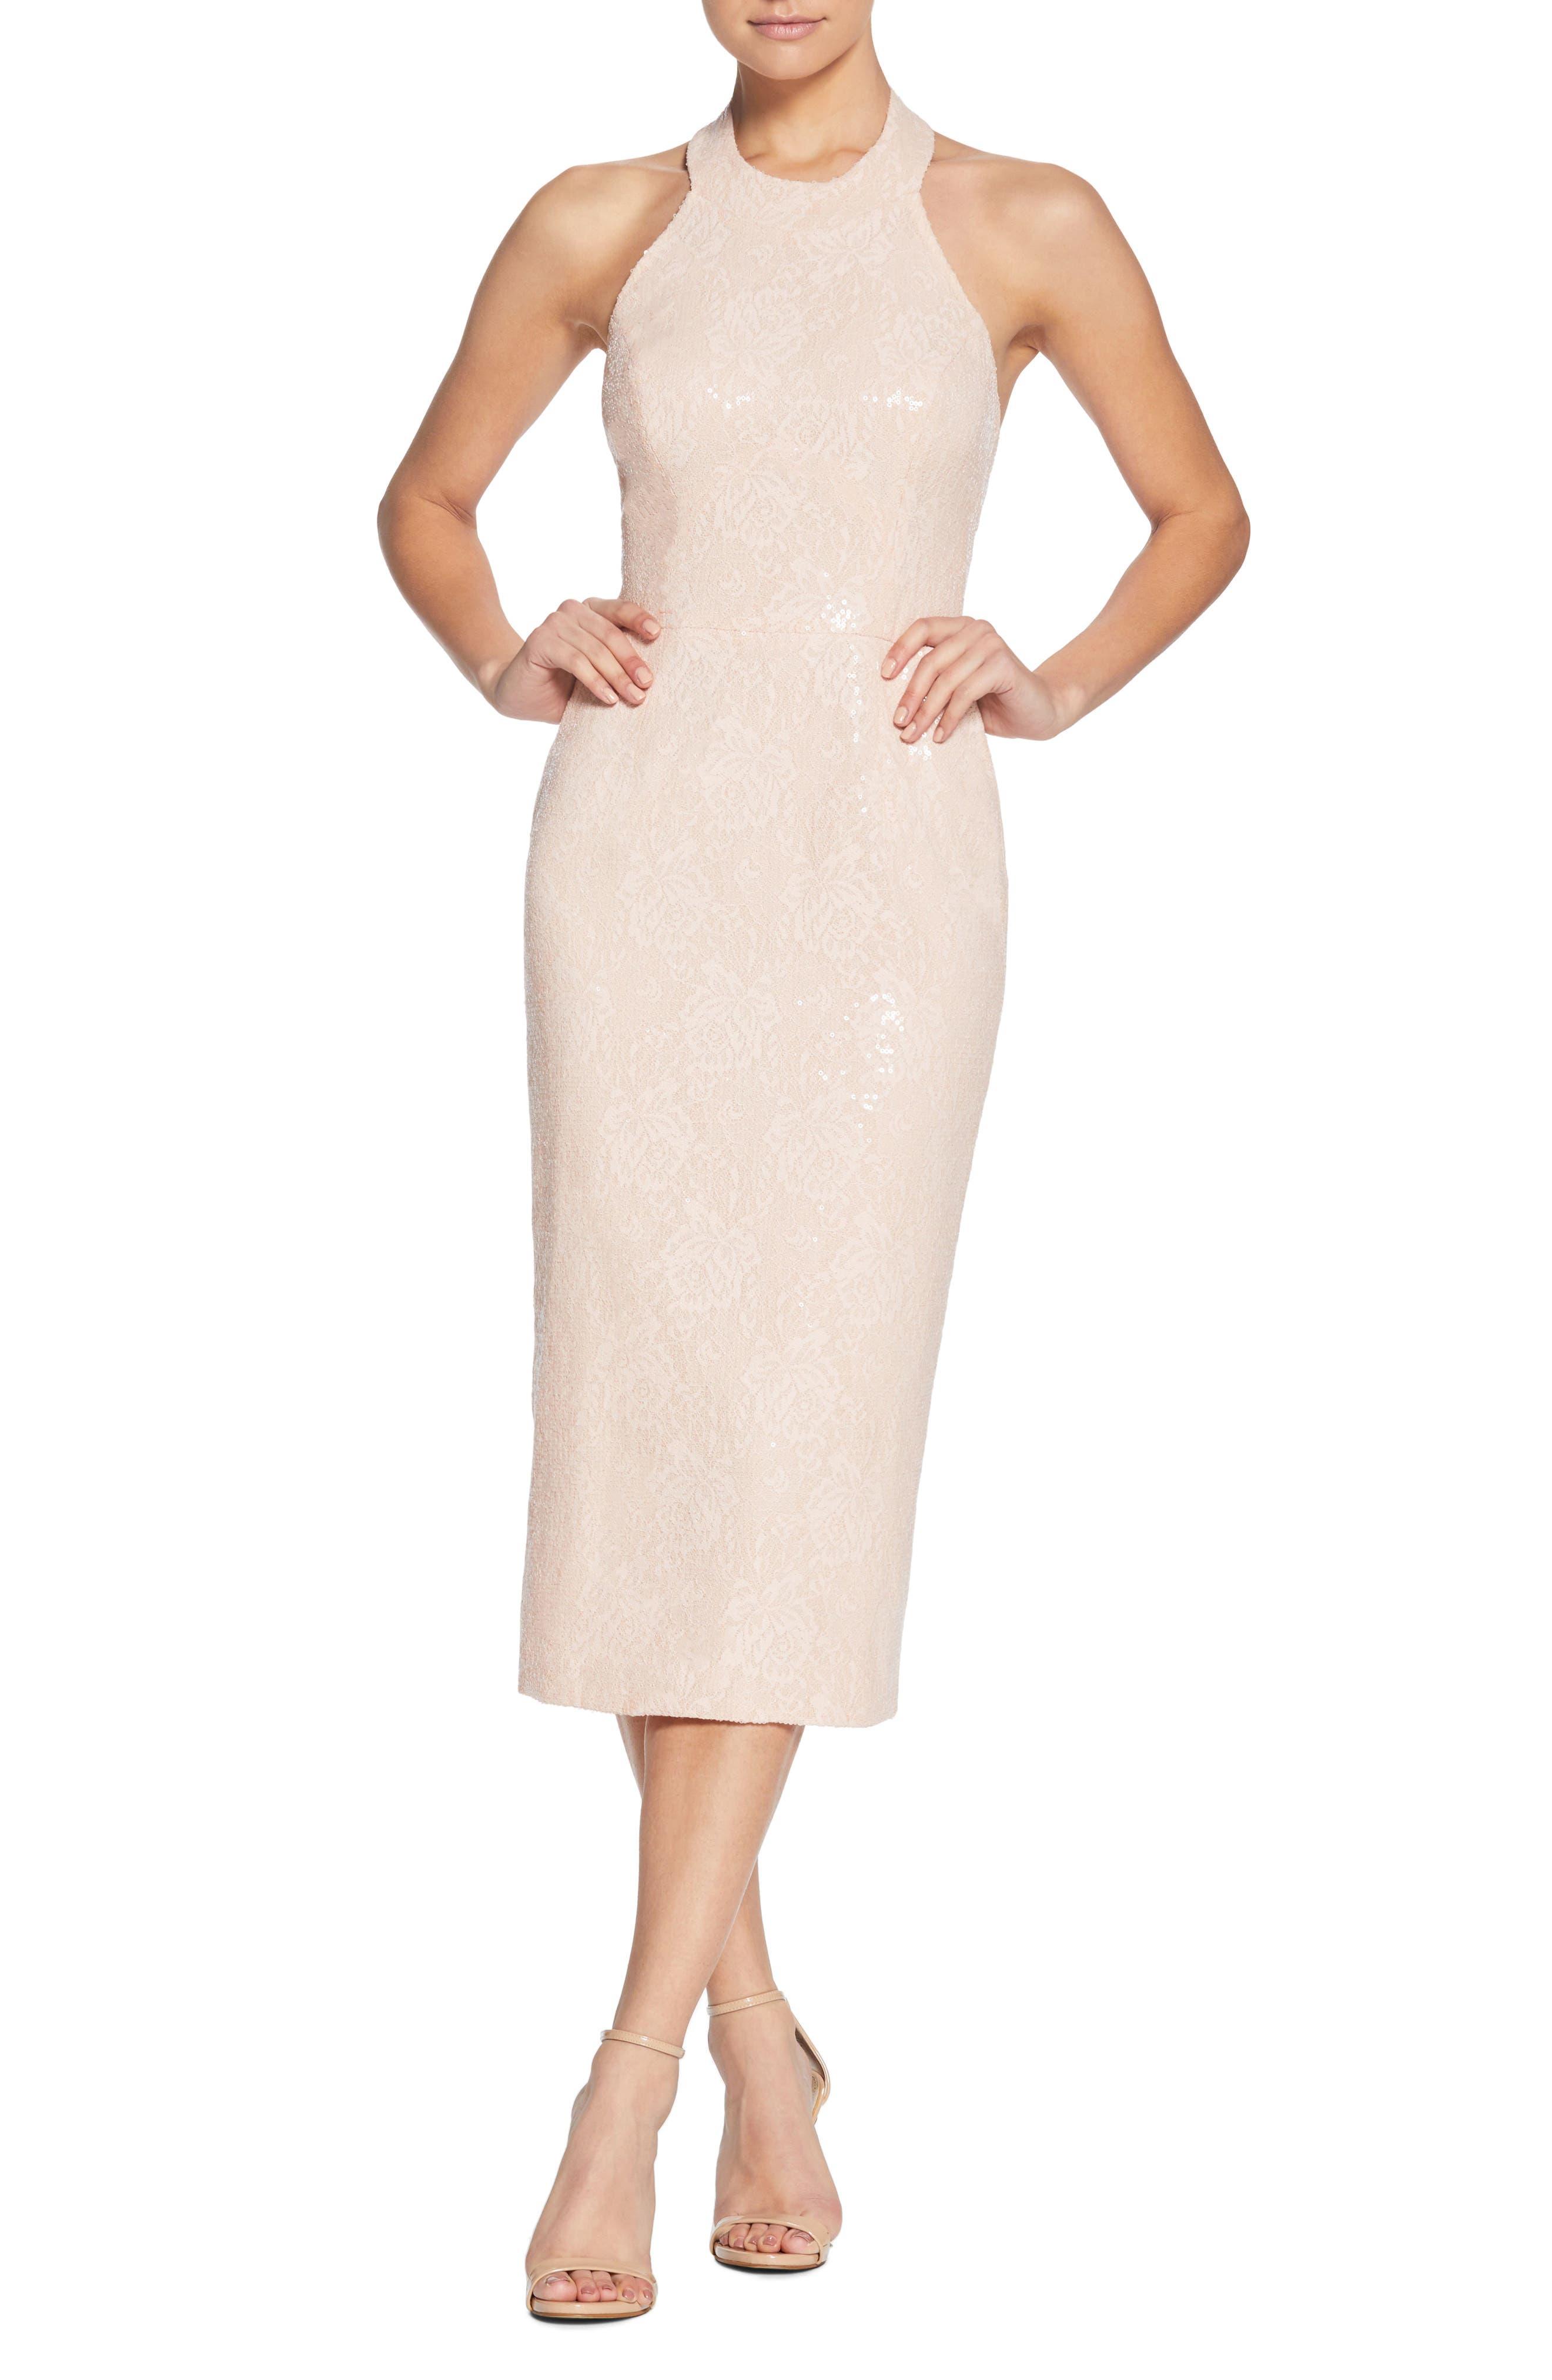 Cassie Halter Sequin Dress,                             Main thumbnail 1, color,                             Pink/ Nude